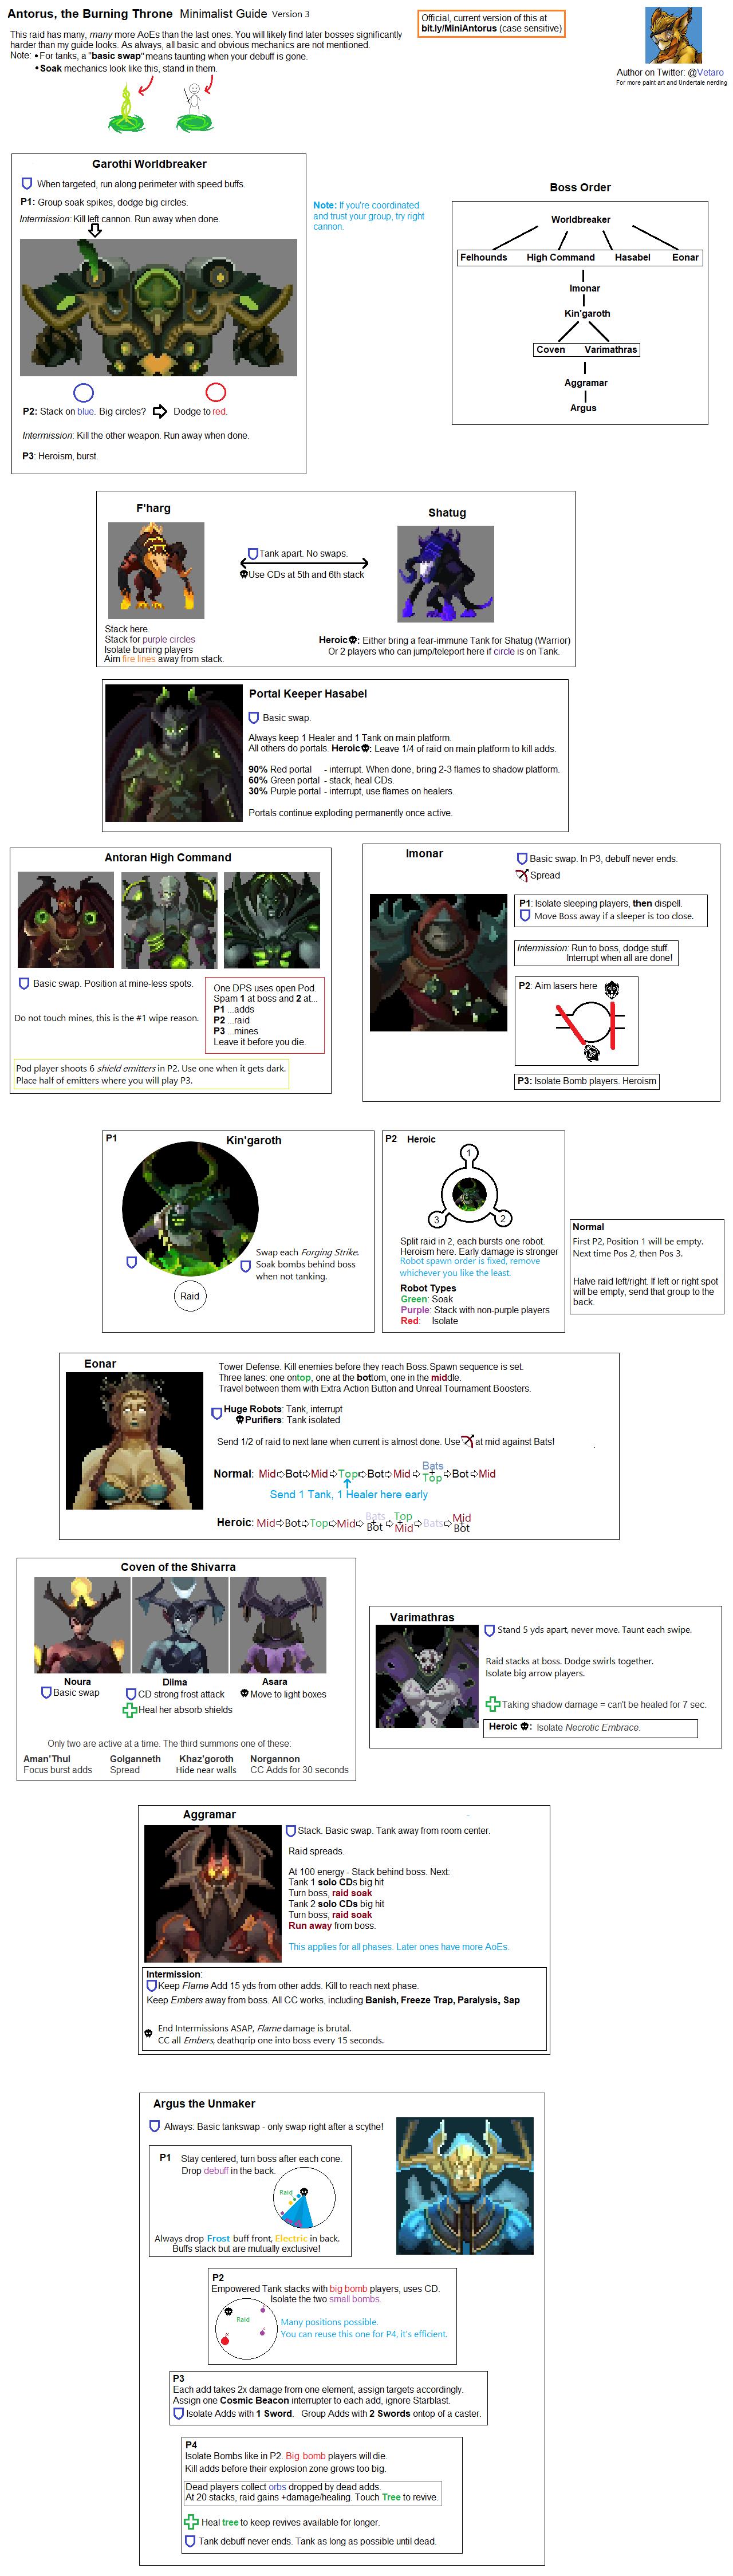 World of Warcraft - Antorus, the Burning Throne Minimalist Raid Guide